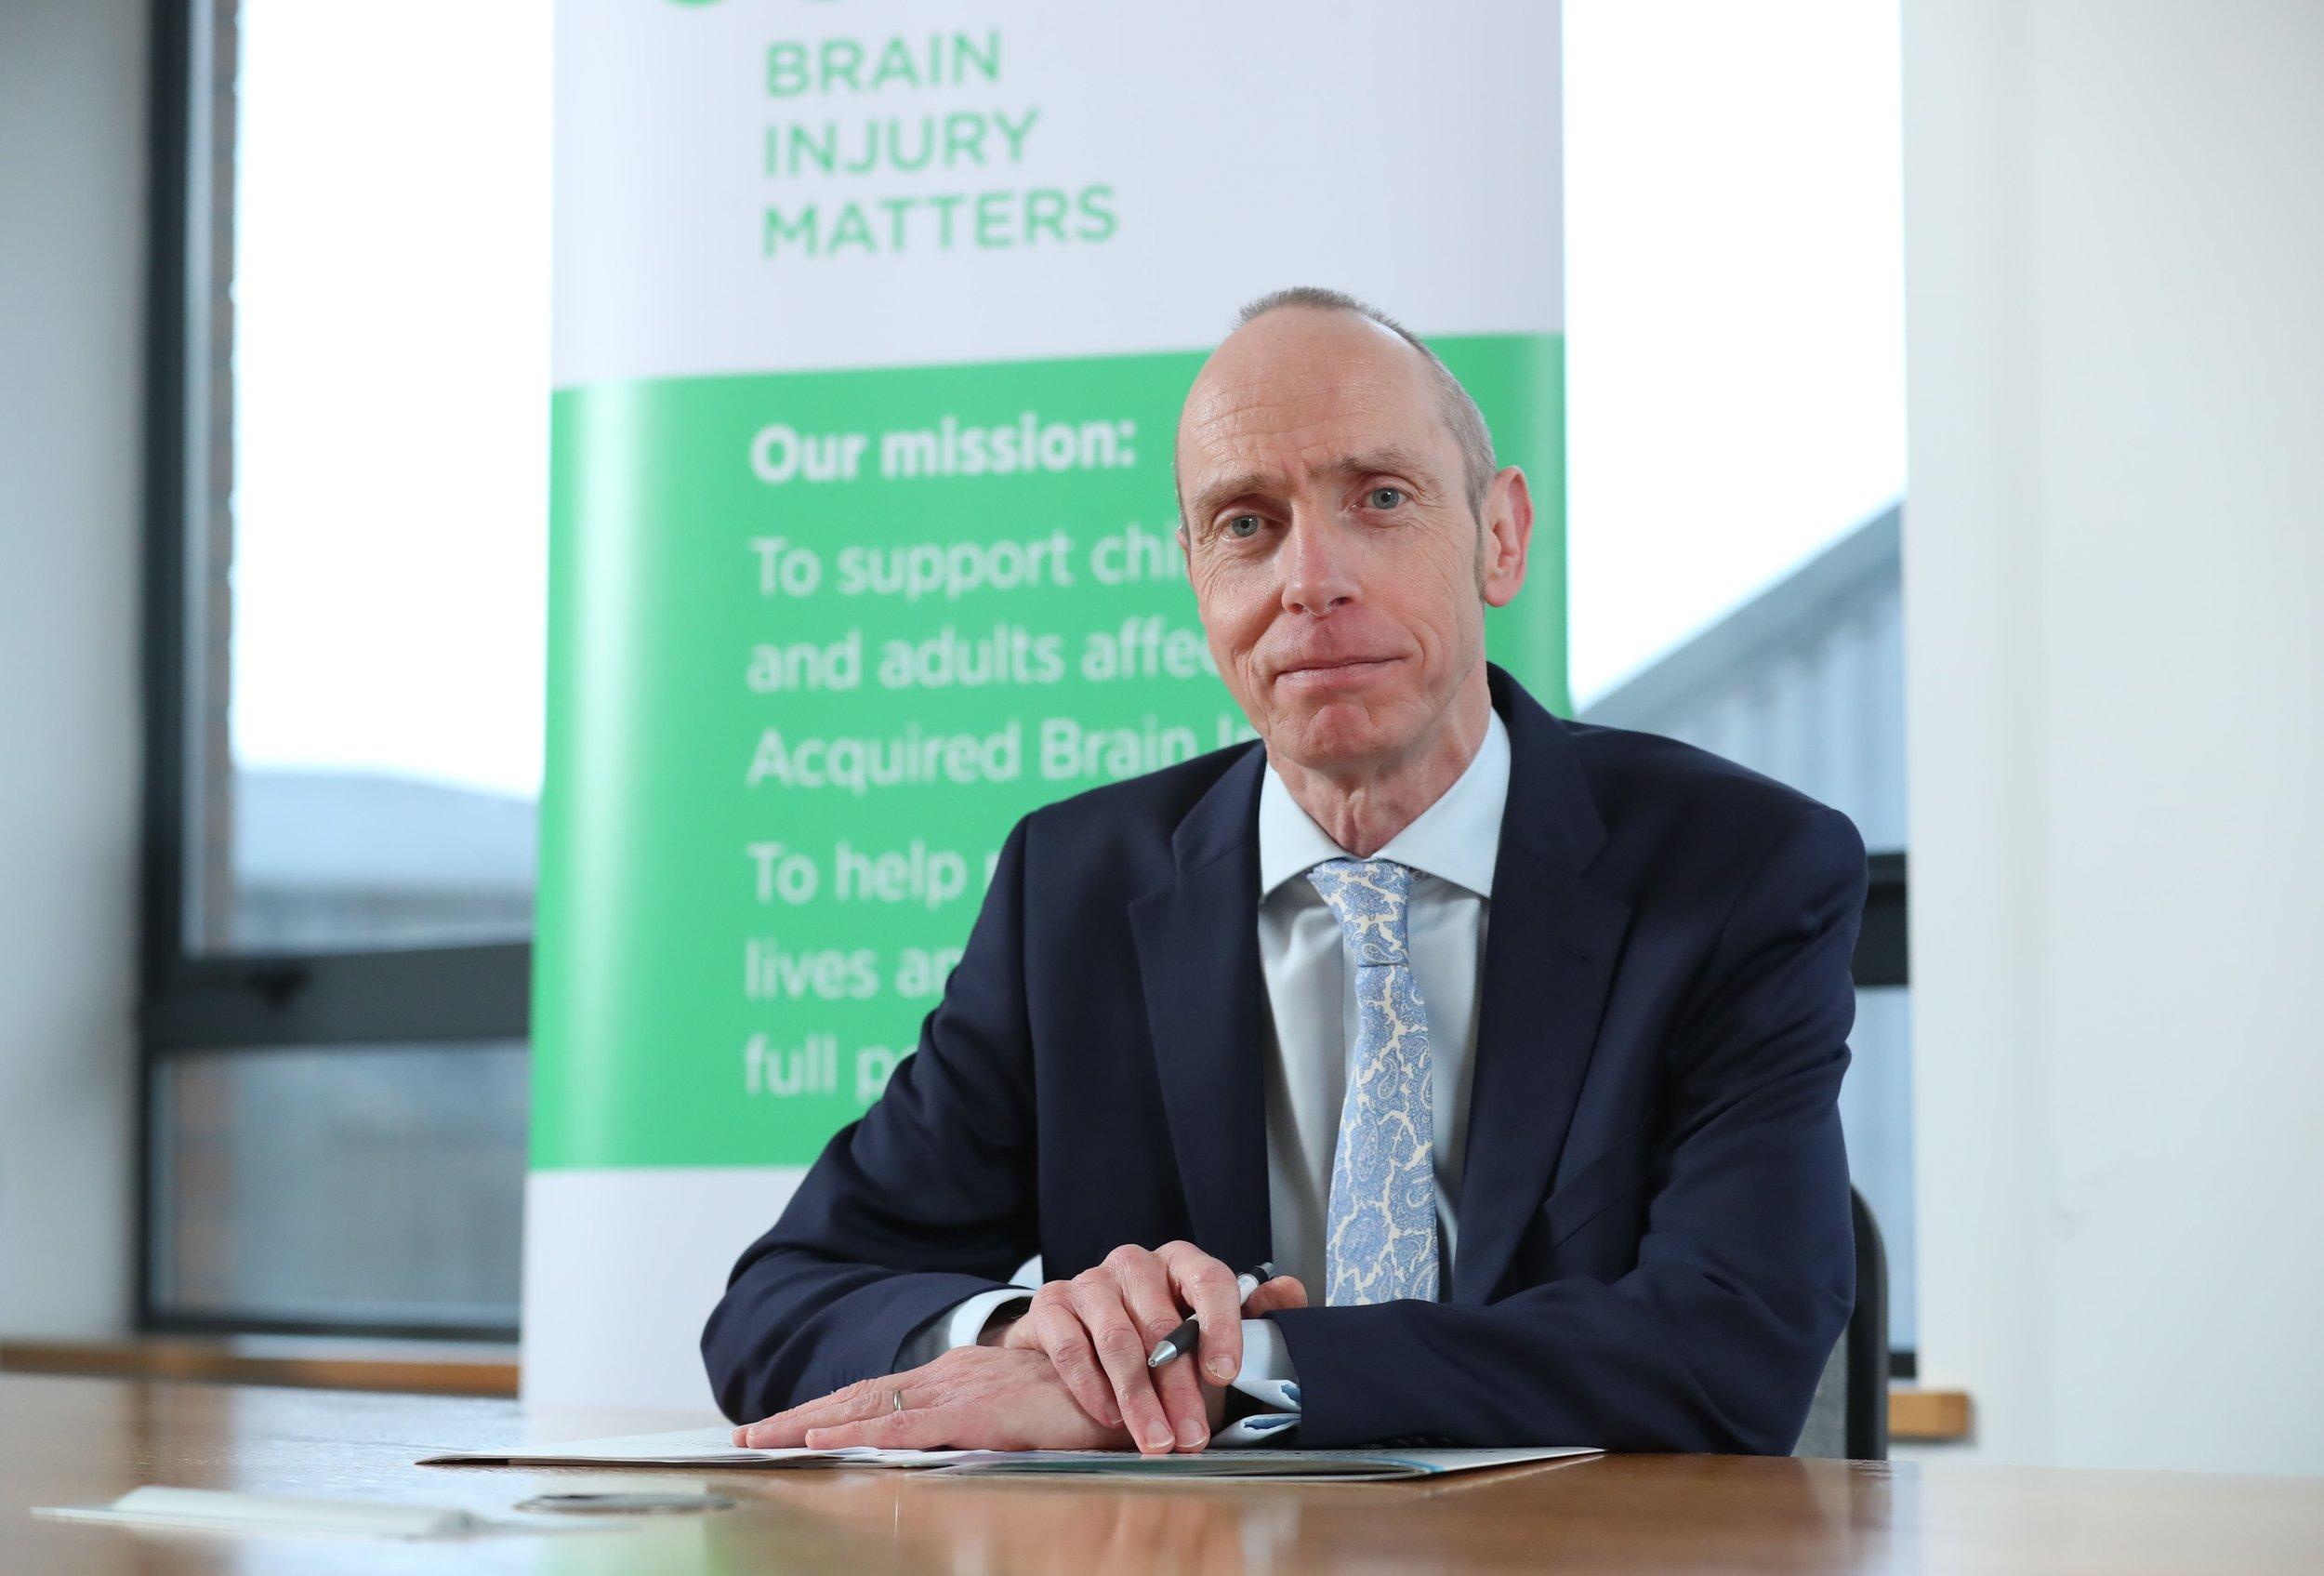 New Chief Executive of Brain Injury Matters, Joe McVey.